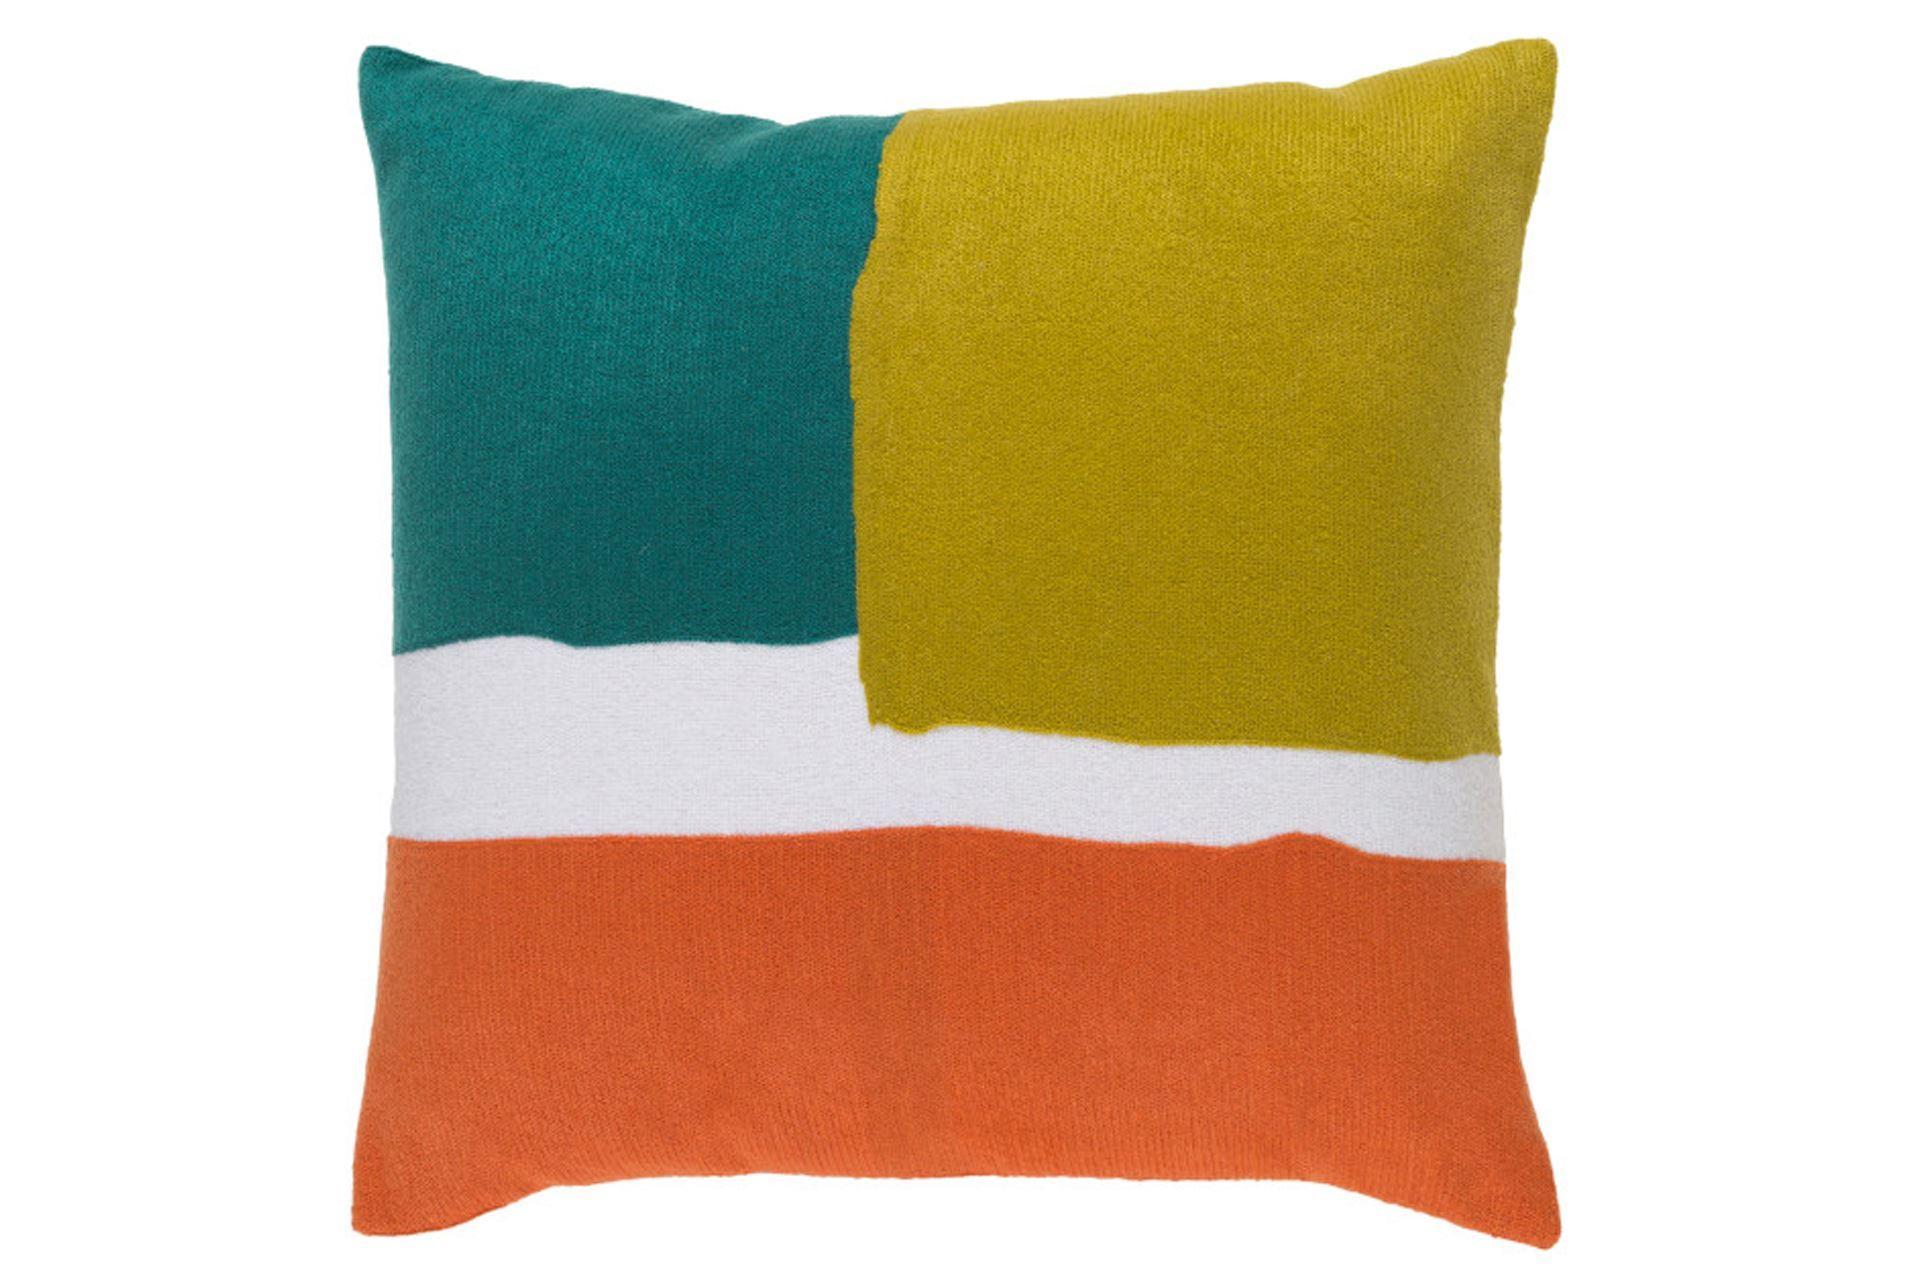 Decorative Pillows Living Spaces : Accent Pillow-Stevens Green Multi 20X20 - Living Spaces